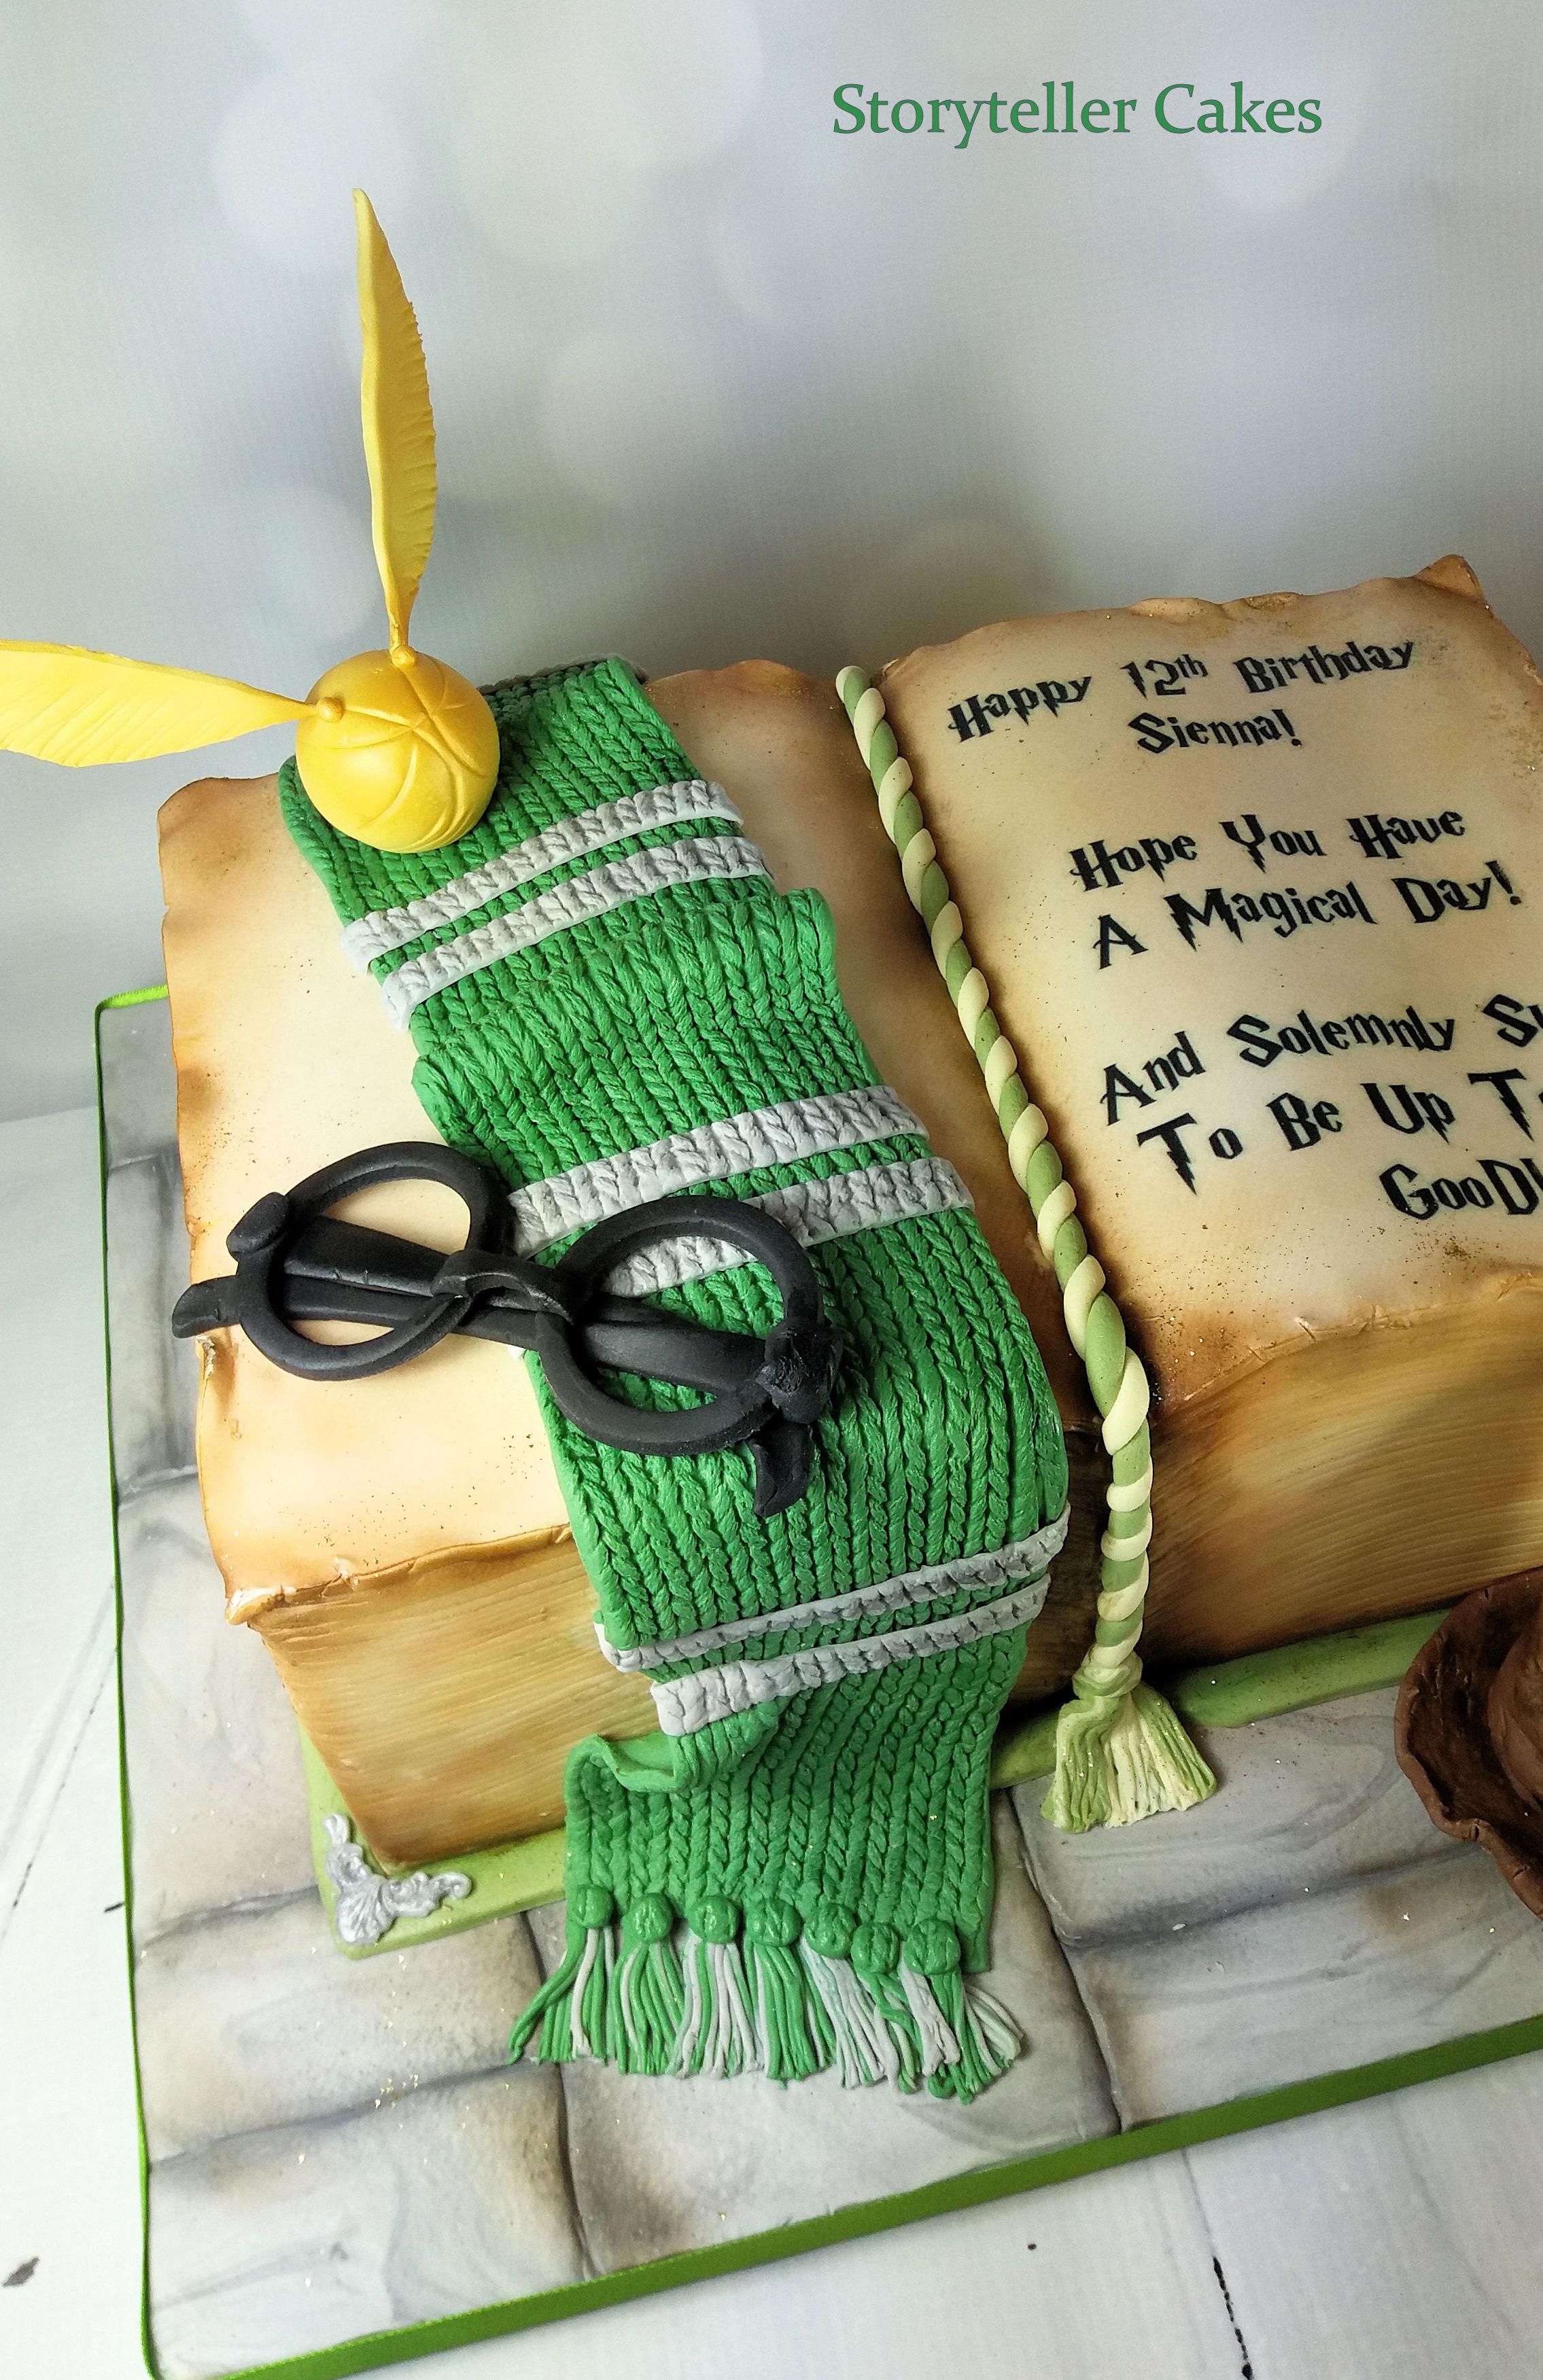 Harry Potter Book Cake 3.jpg